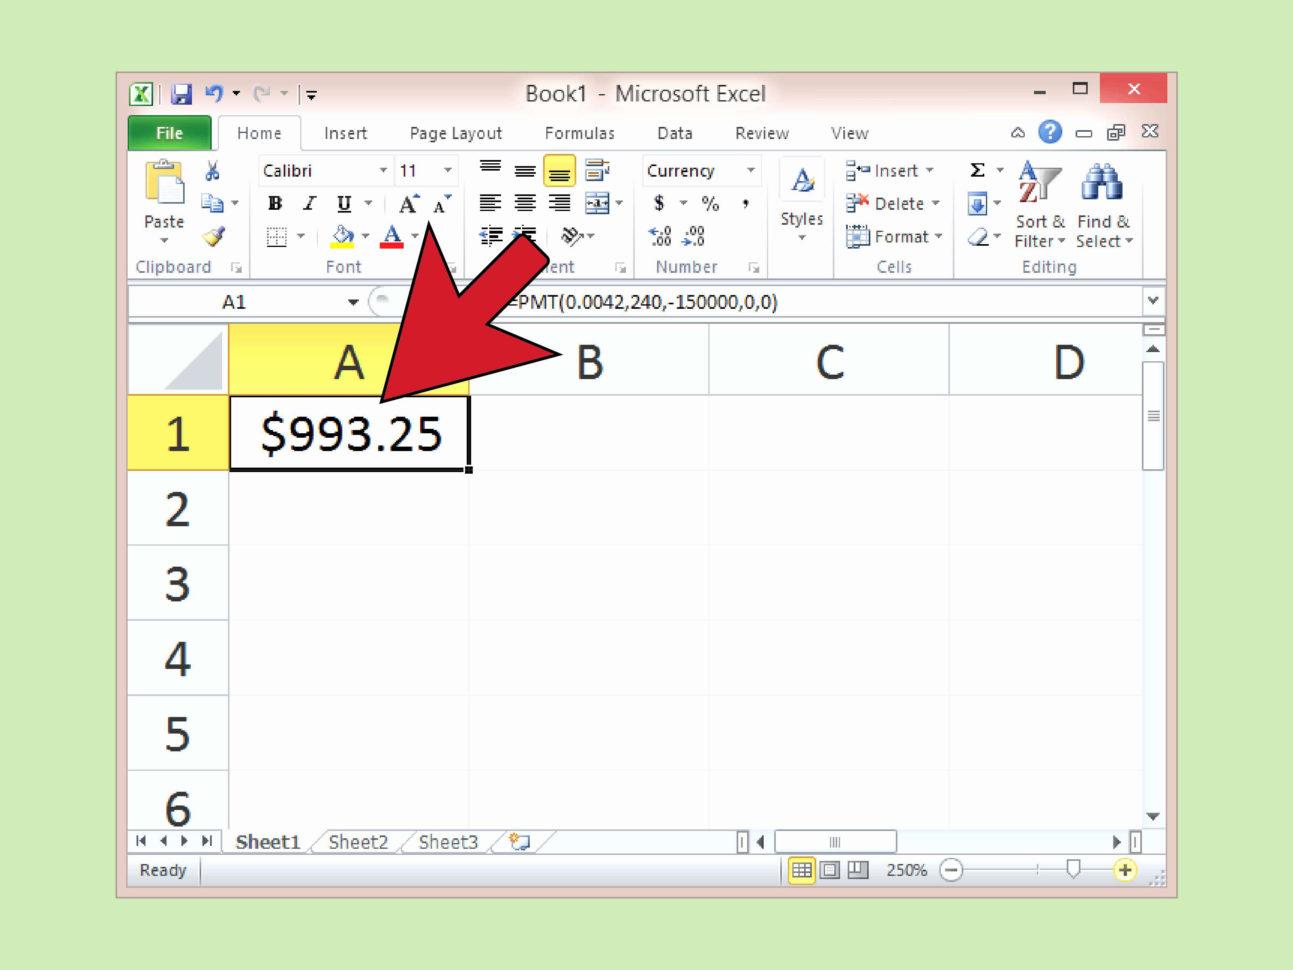 Nist 800 53 Controls Spreadsheet Xls Regarding Nist 800 53 Security Controls Spreadsheet As Well As 800 53 Rev 4